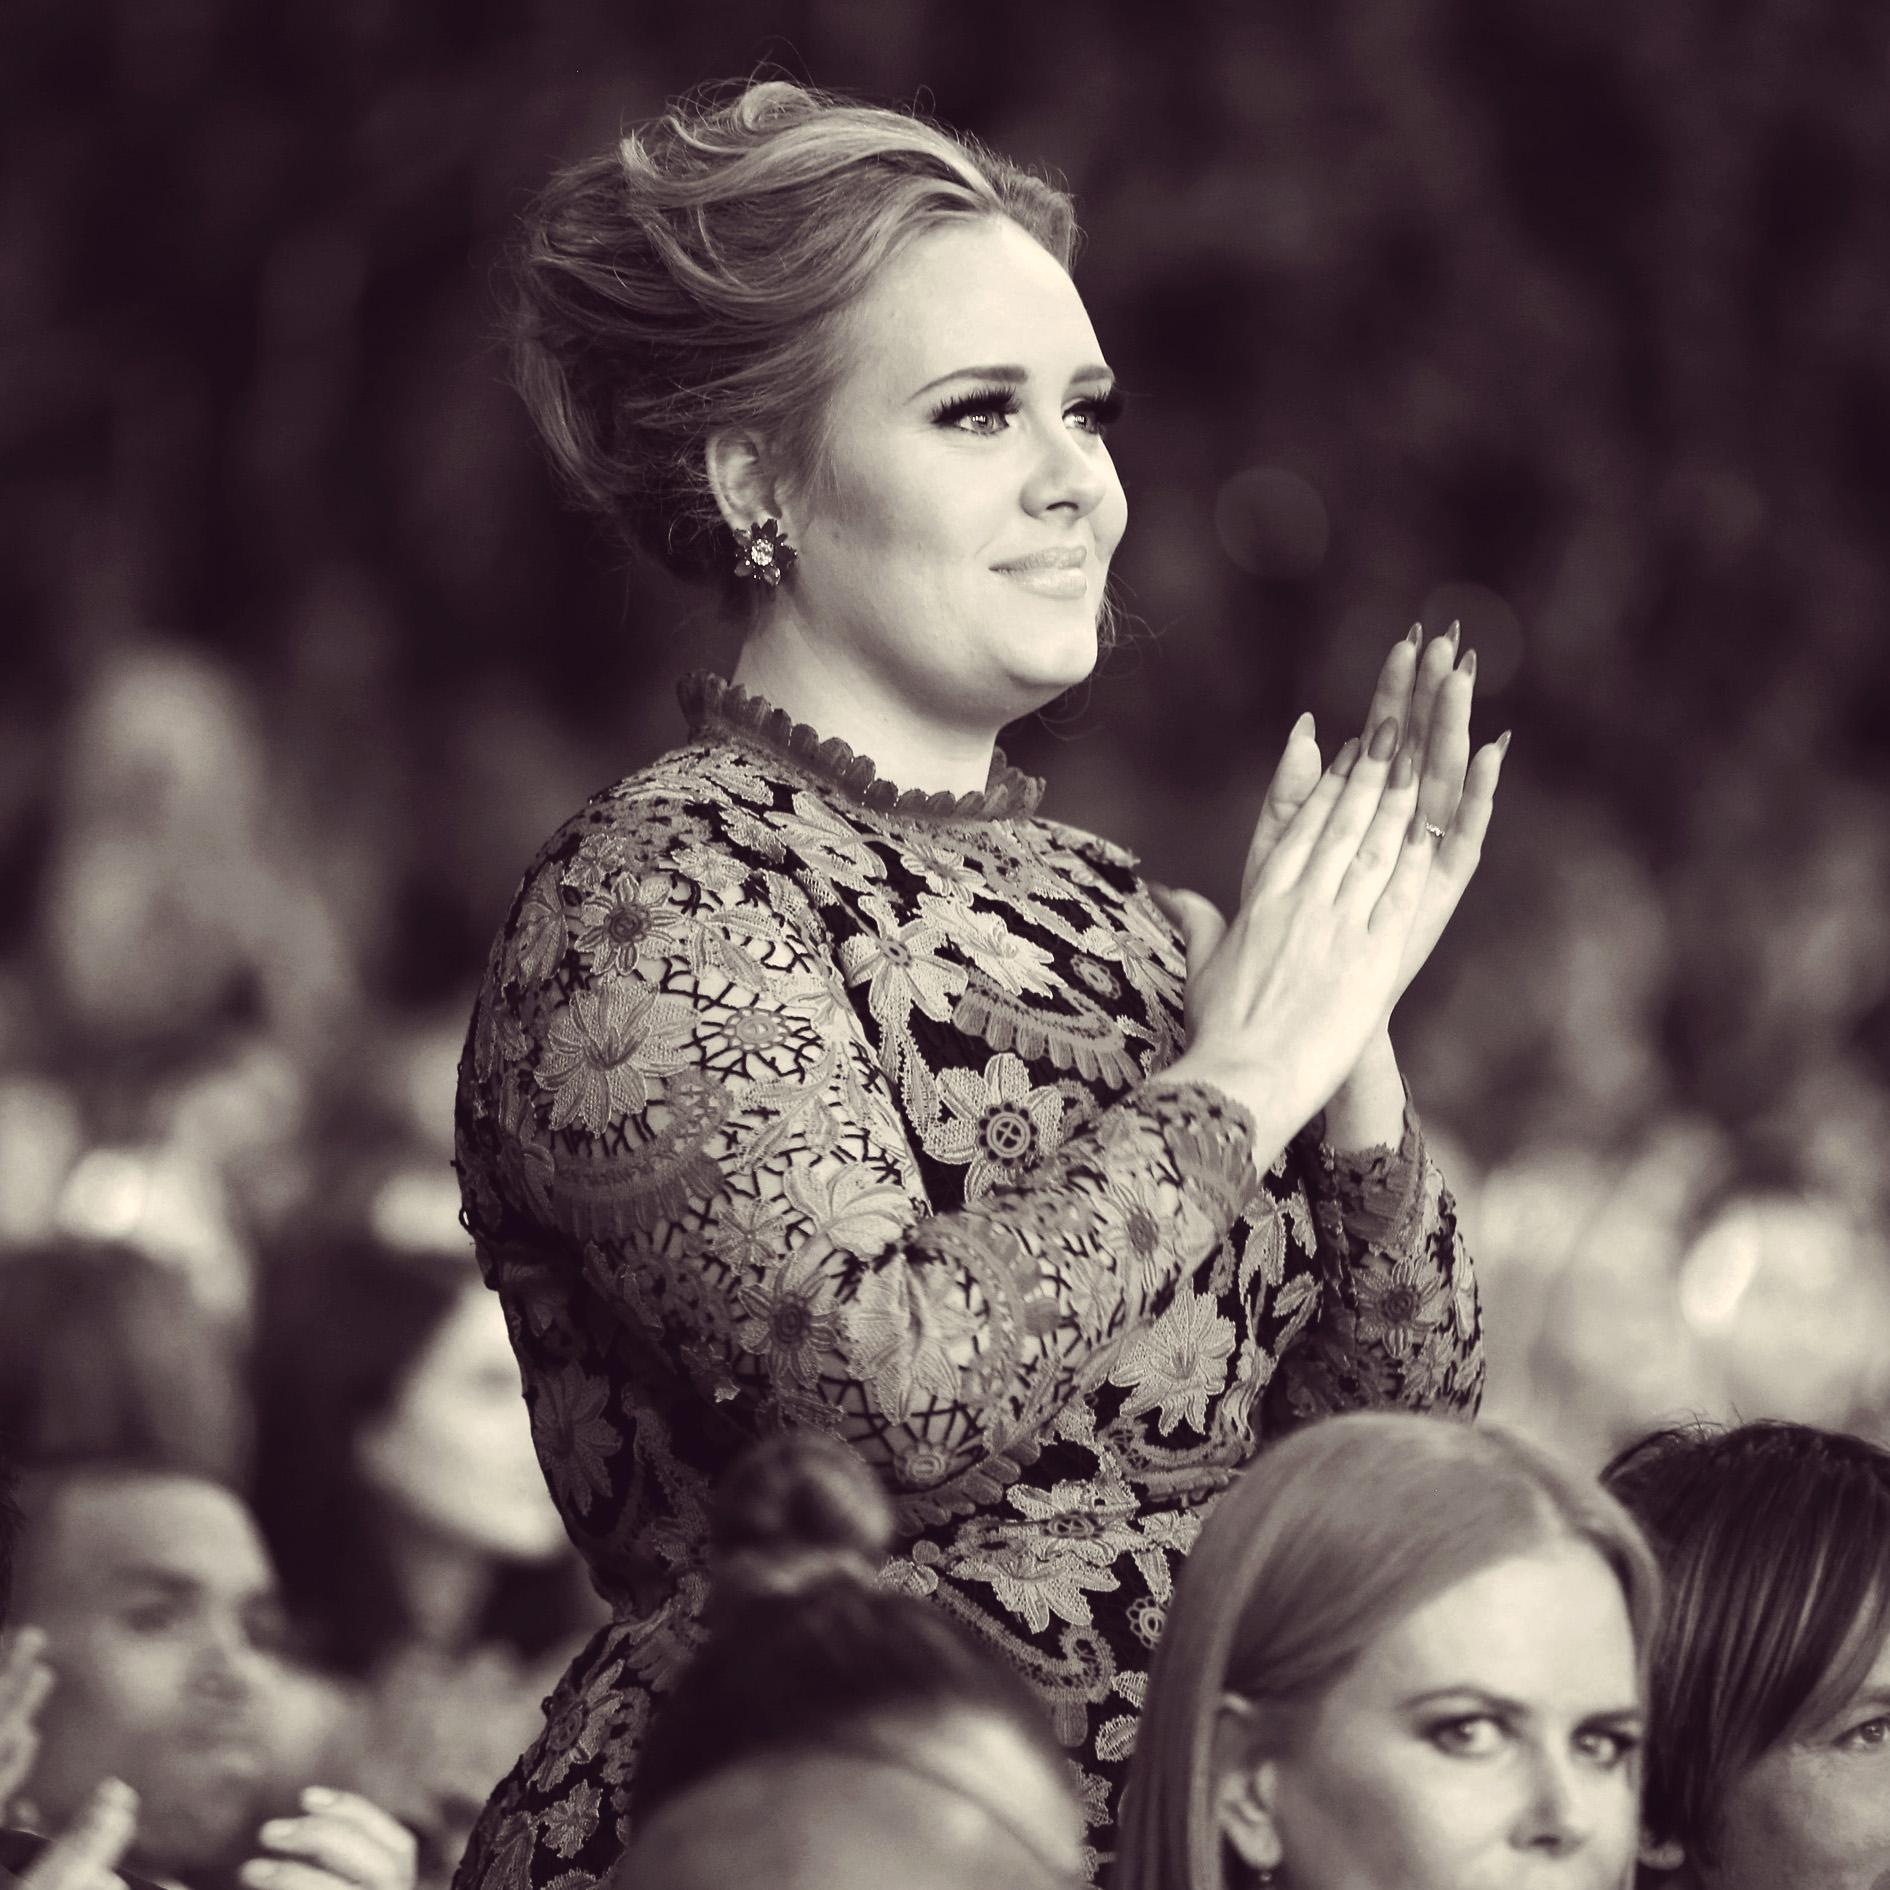 Adele's New Album Not Due Until 2015